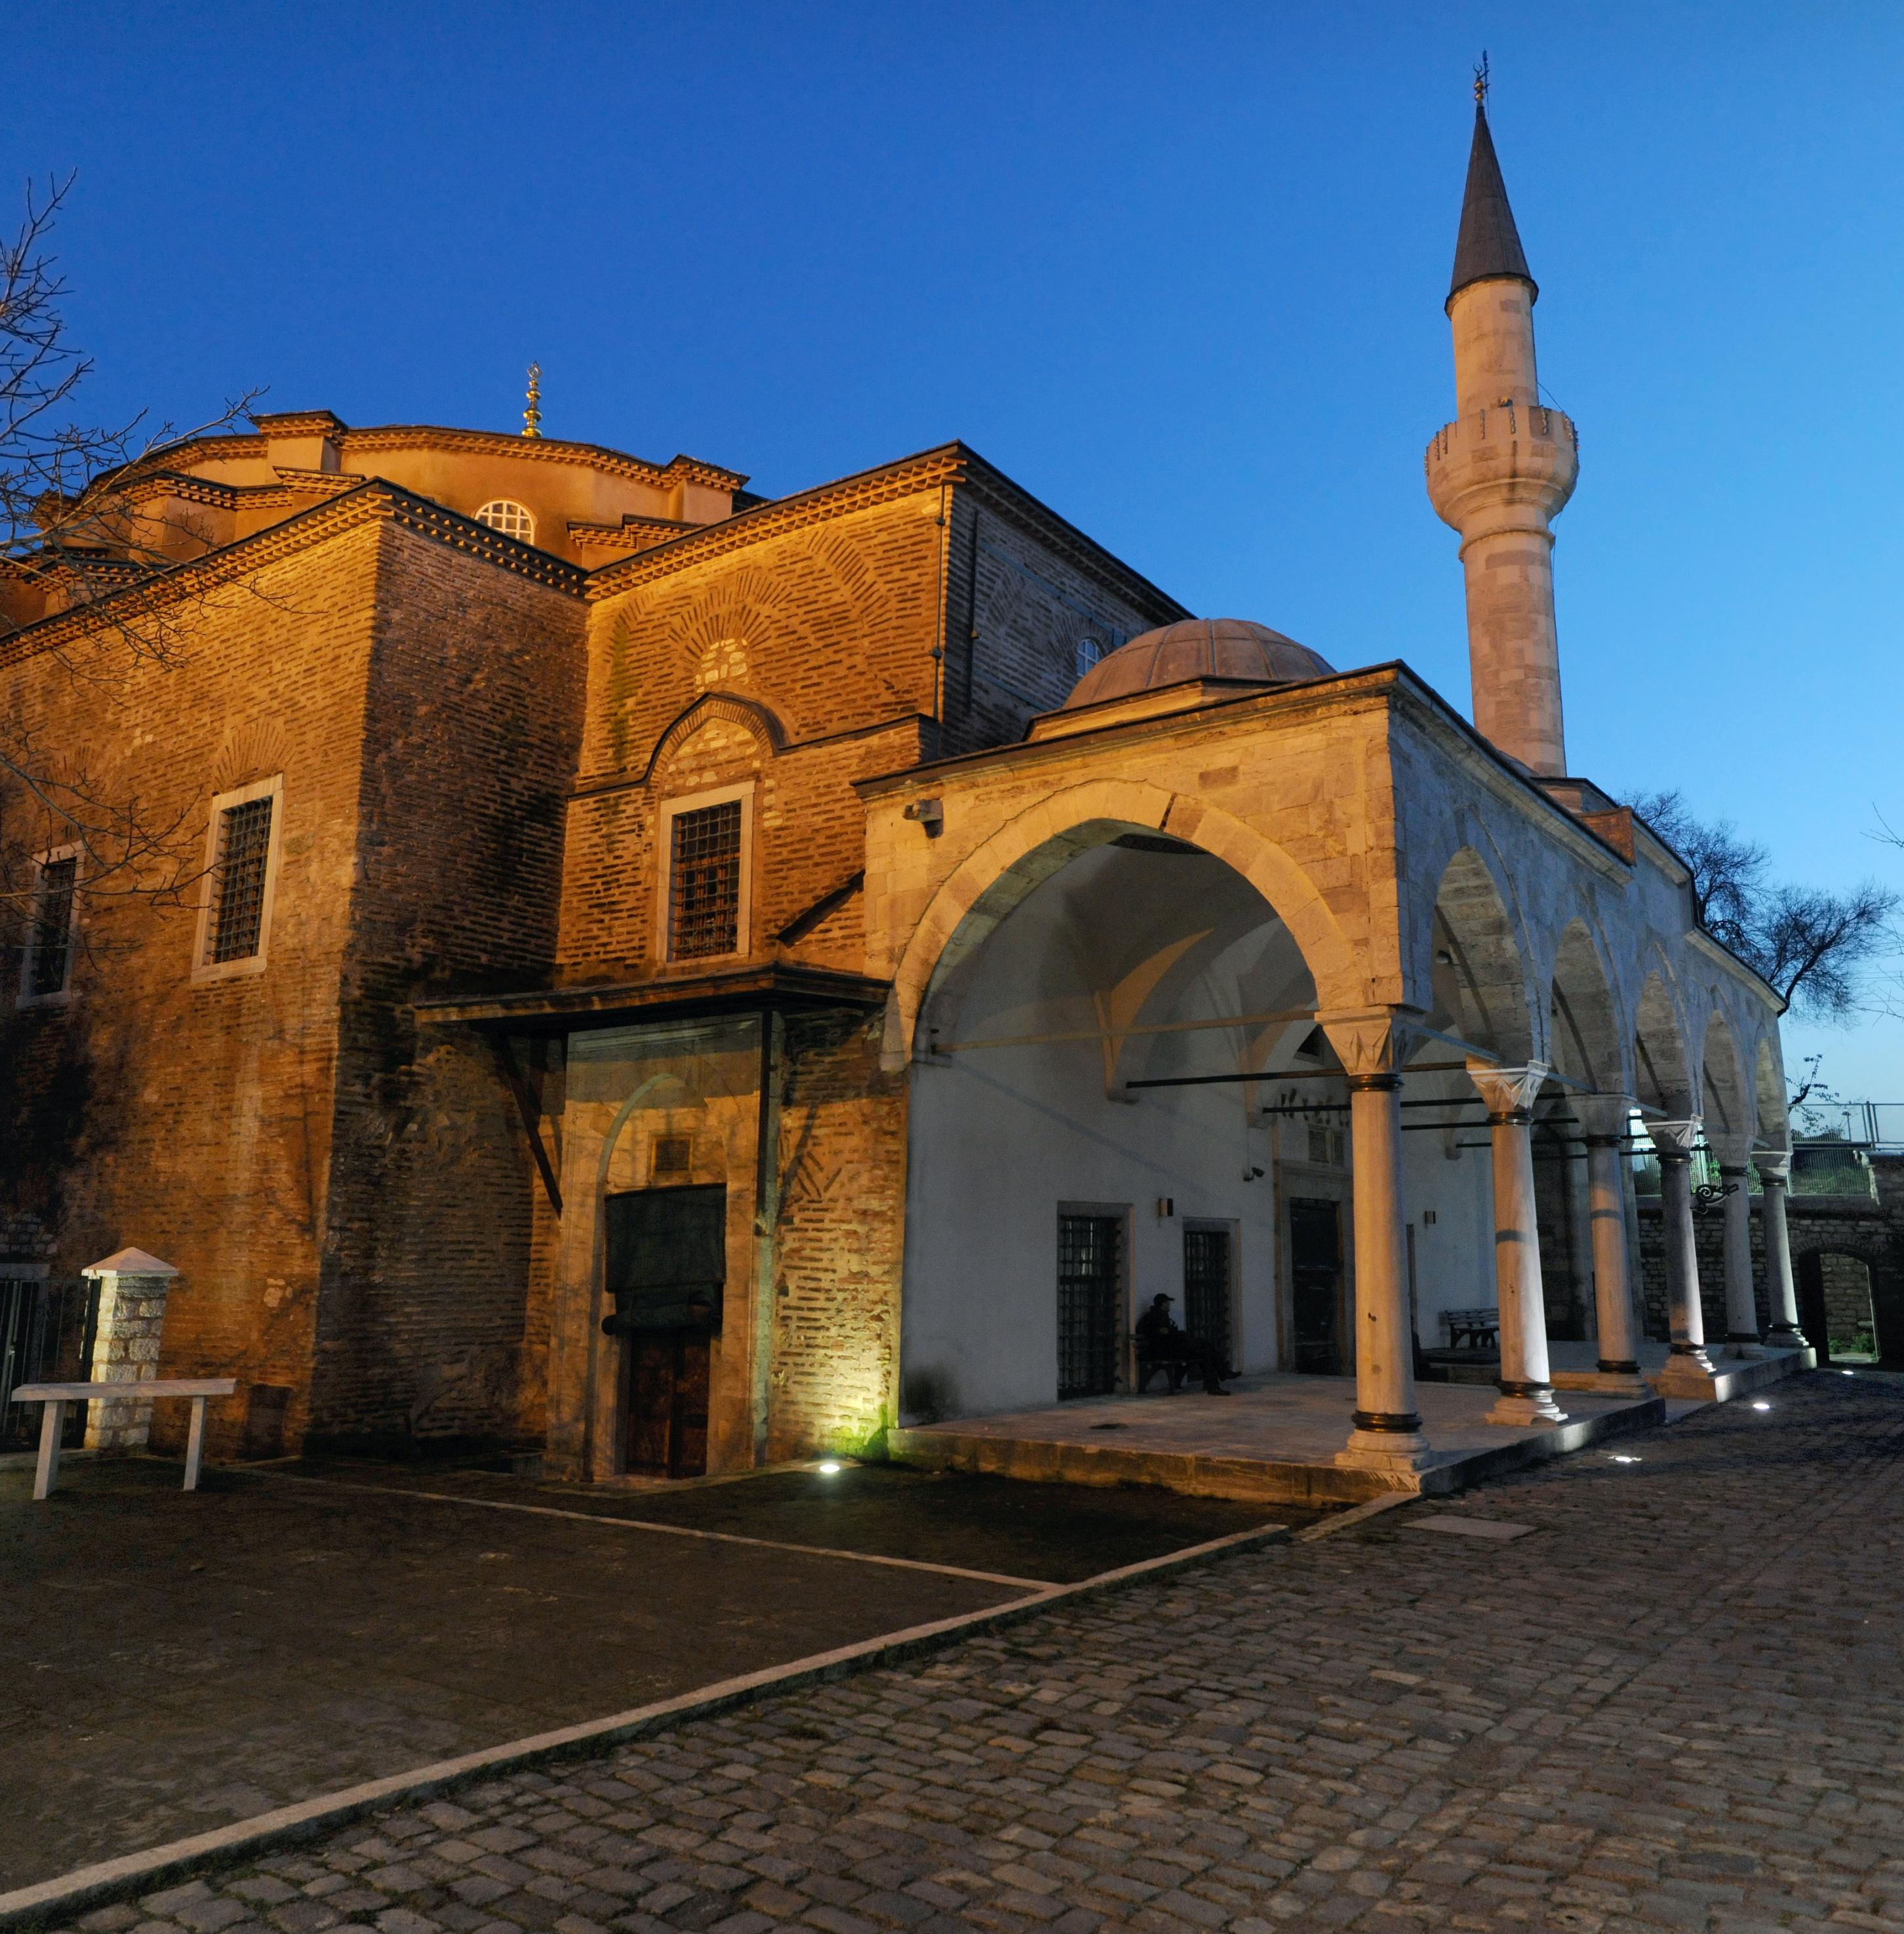 File:20101222 Kucuk Ayasofya Mosque Istanbul Turkey.jpg - Wikimedia Commons